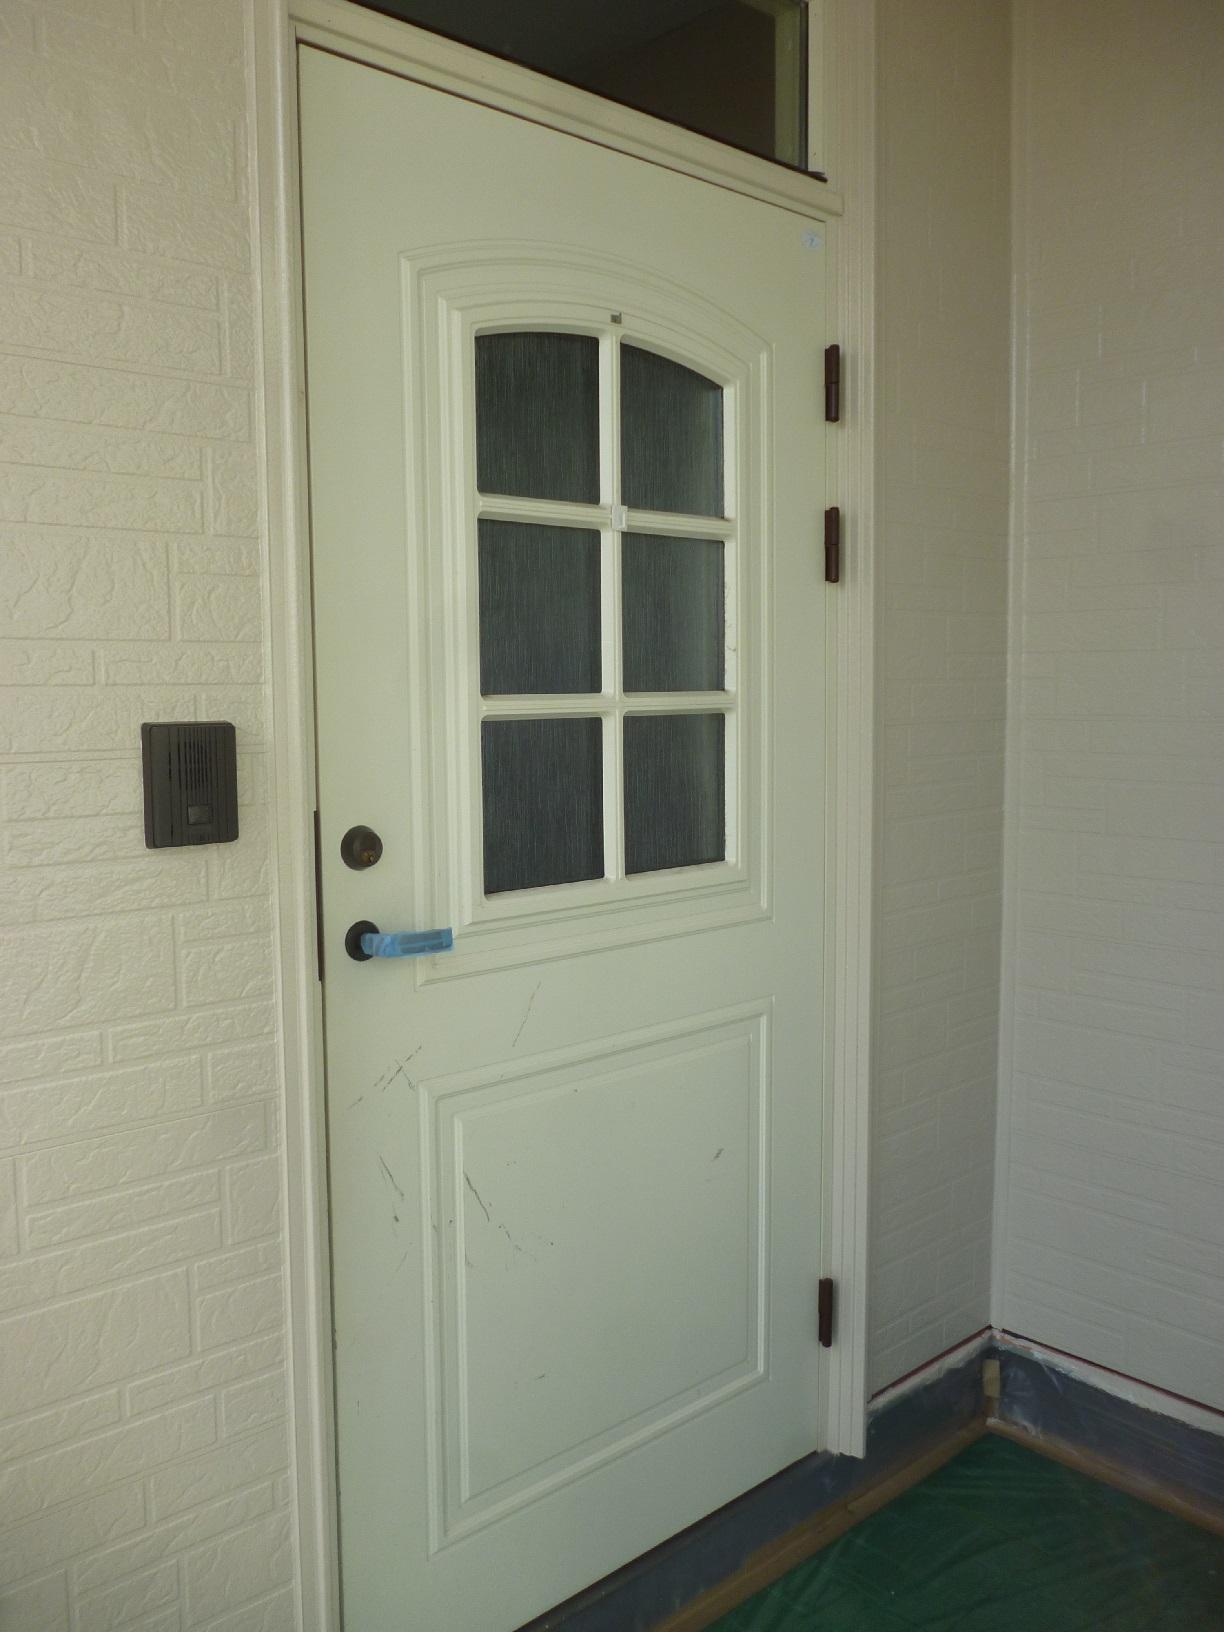 文苑N様邸 玄関ドア 下処理1